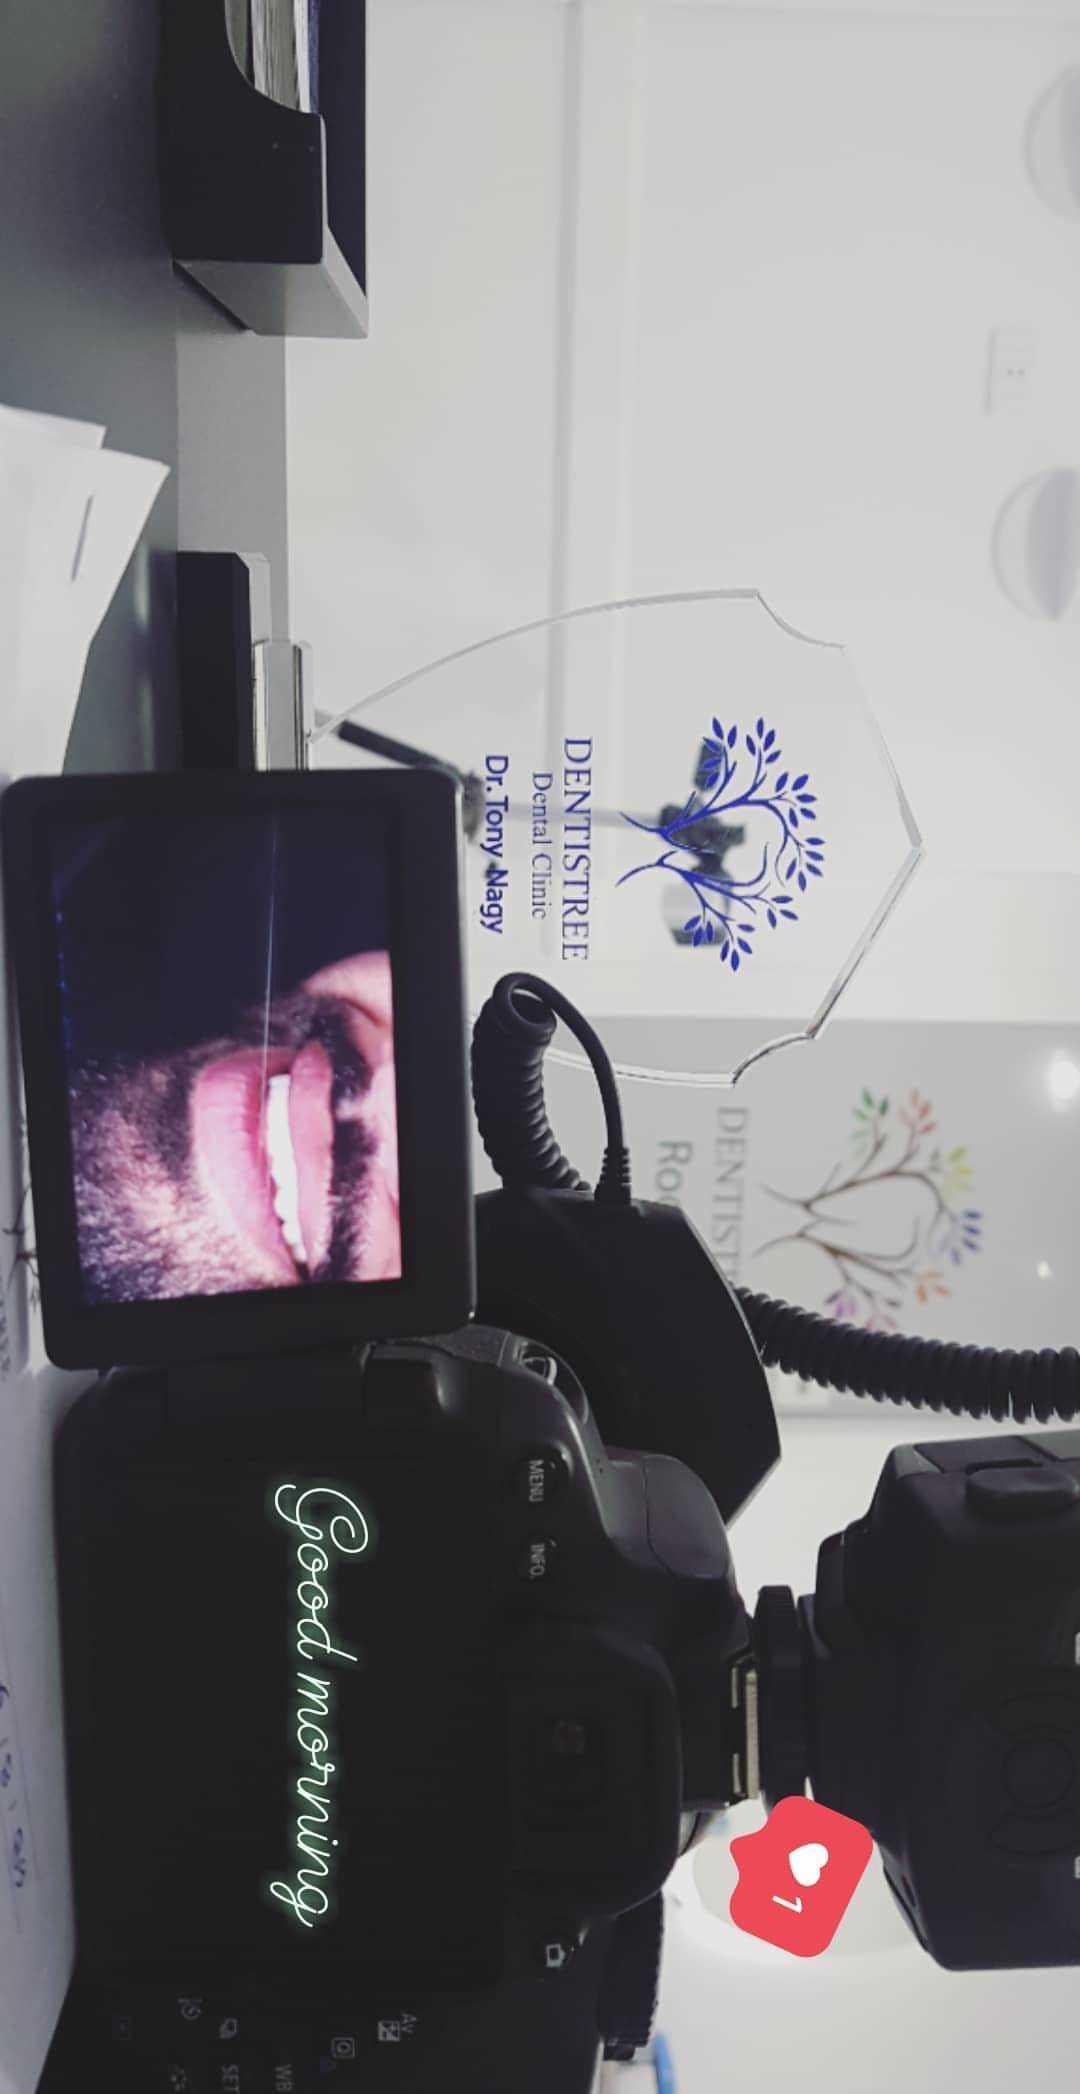 Book now with Doctor Tony Nagy Dentist - Vezeeta com